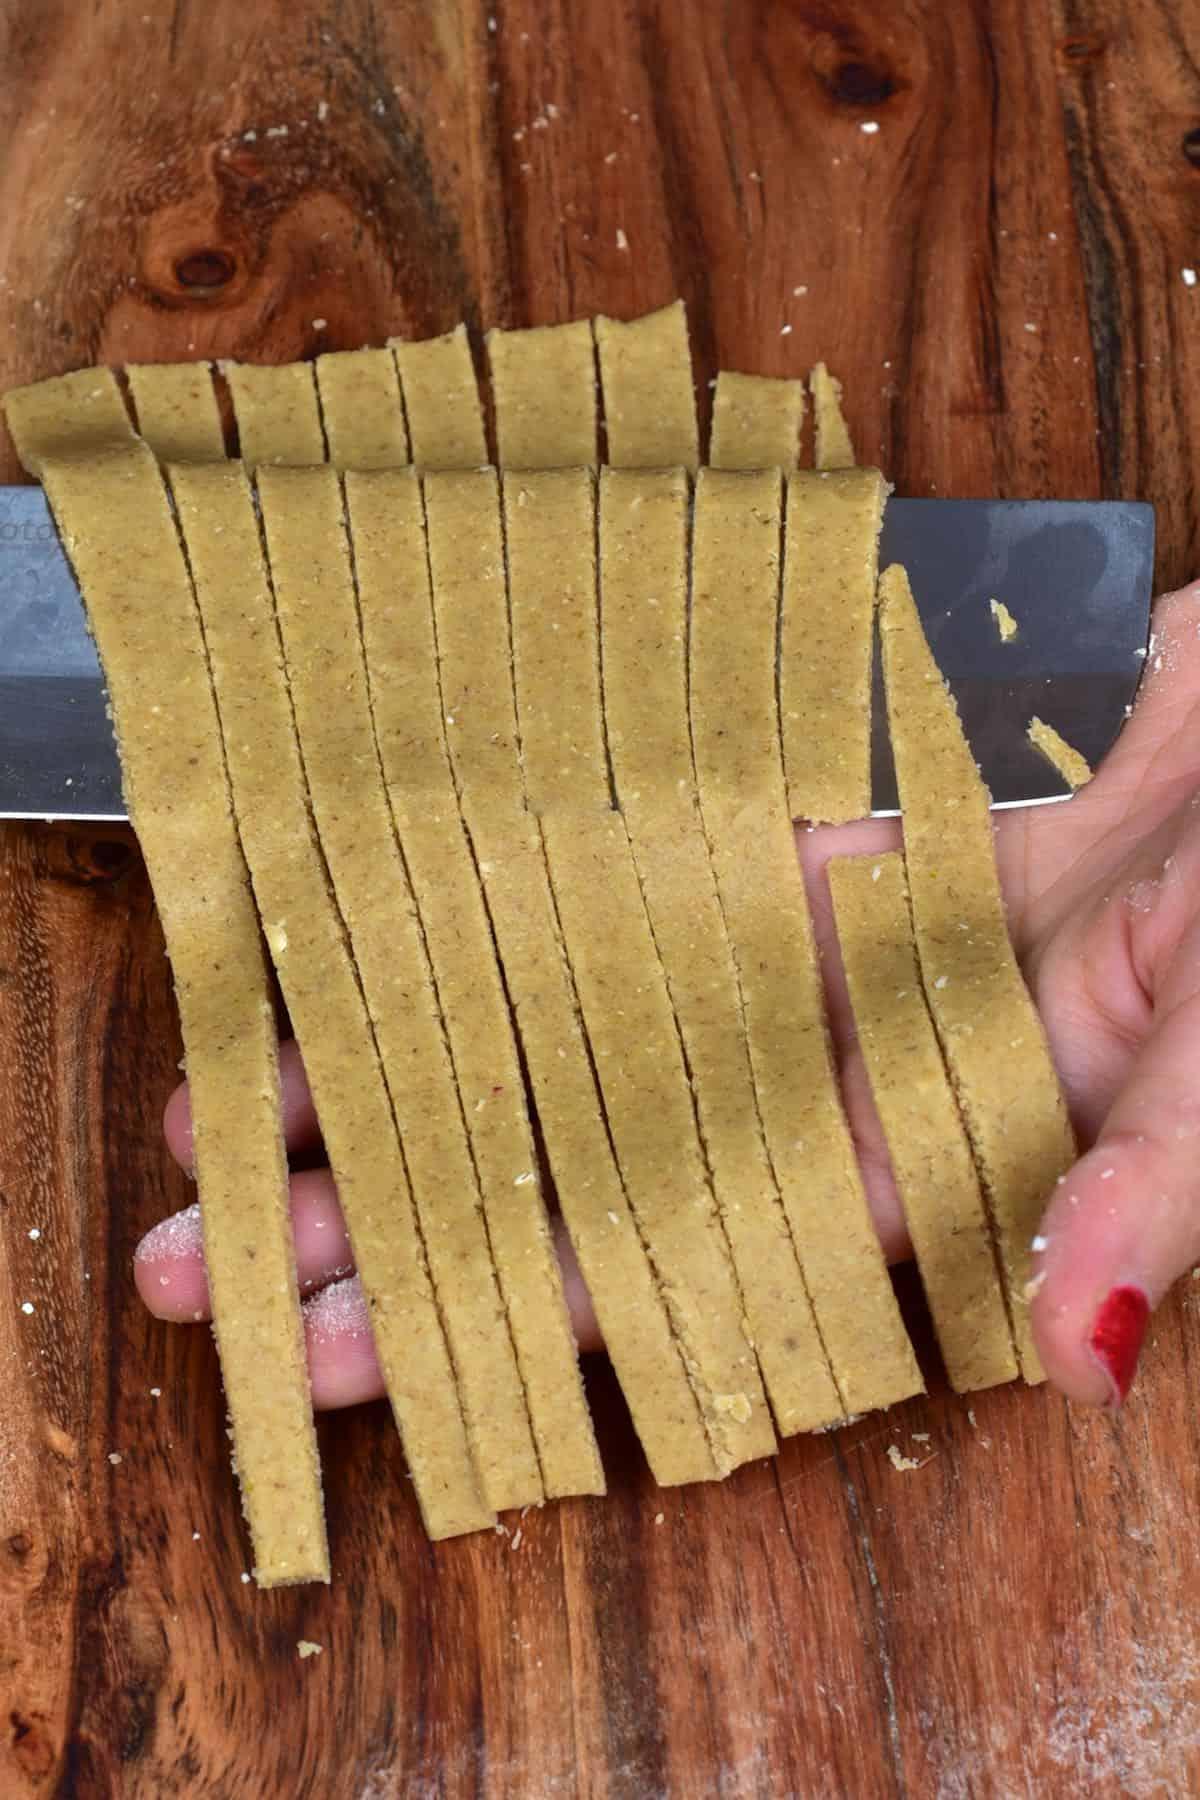 Sliced oat pasta resting on a knife